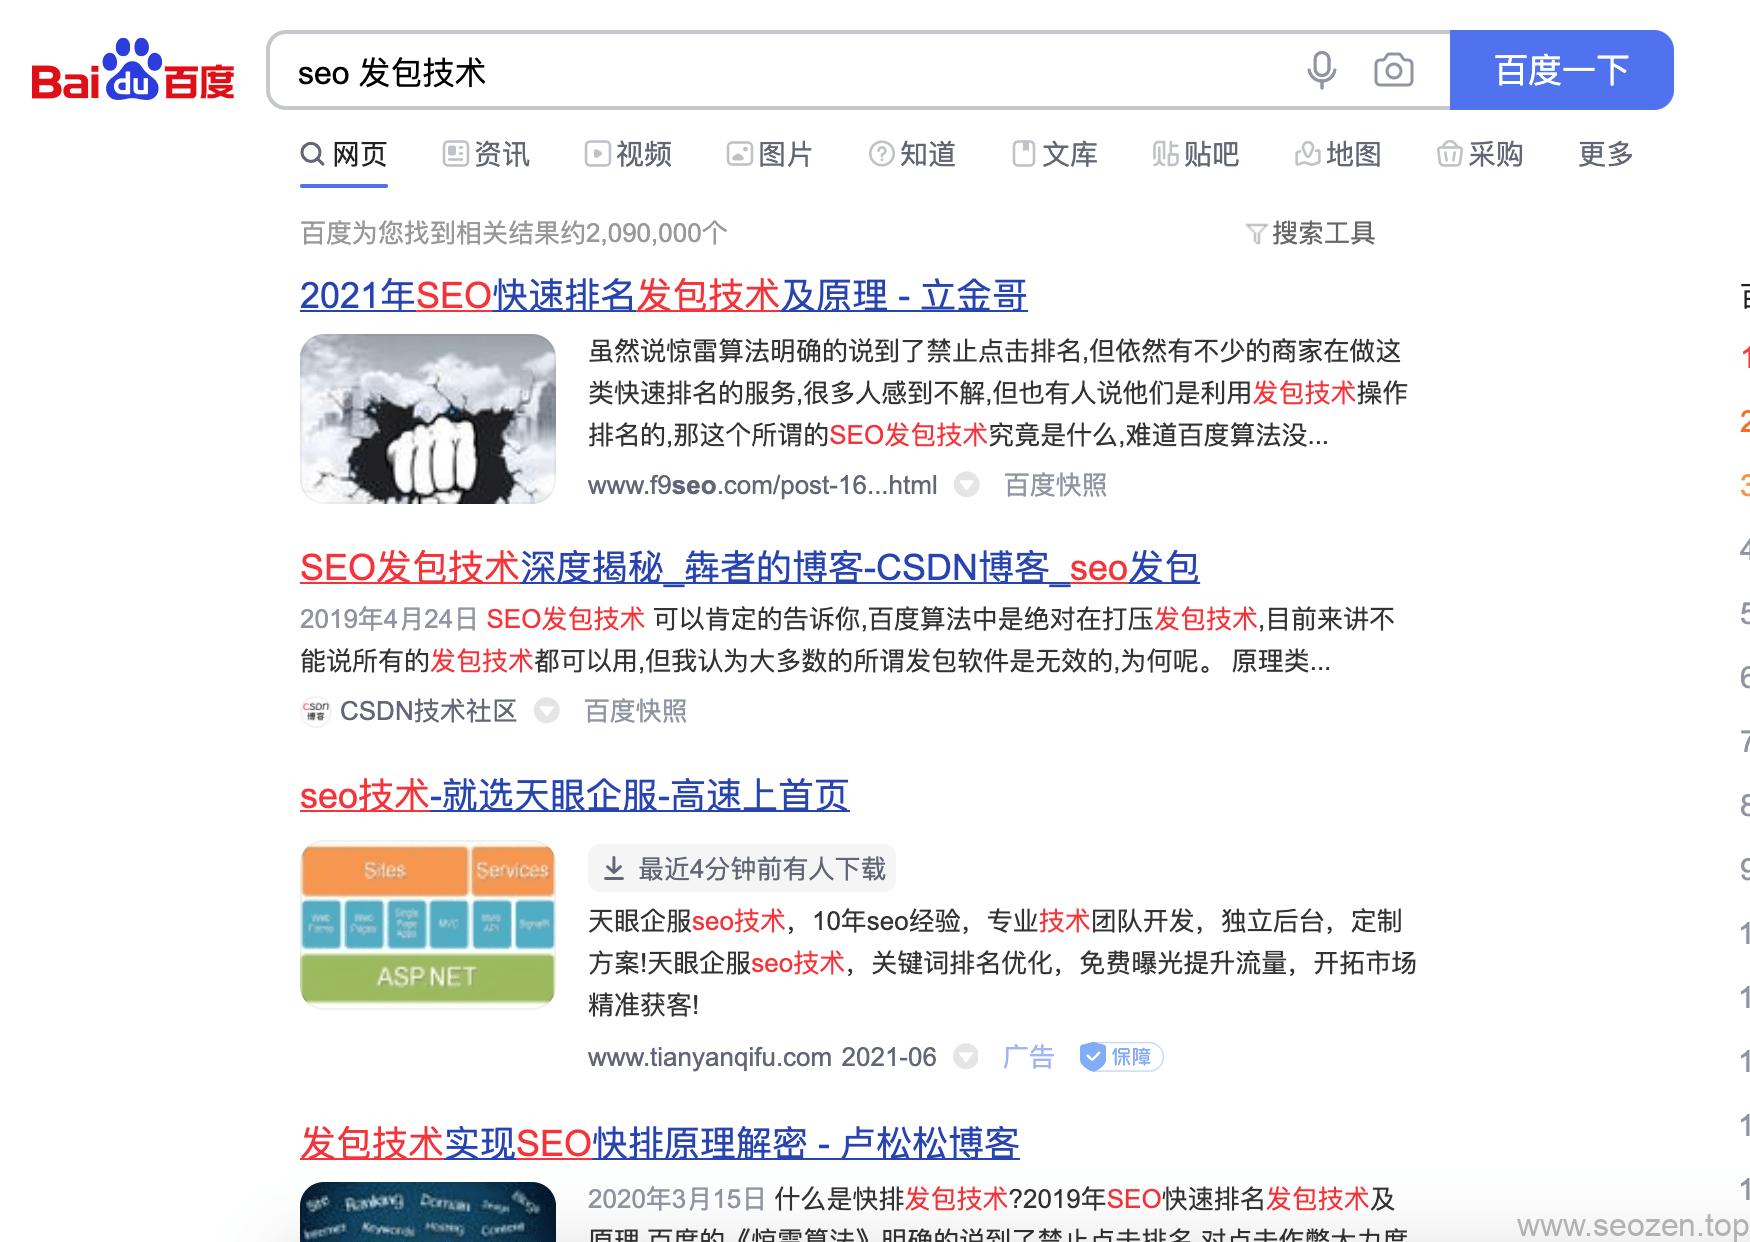 2021-qucik-ranking-tech-baidu-seo